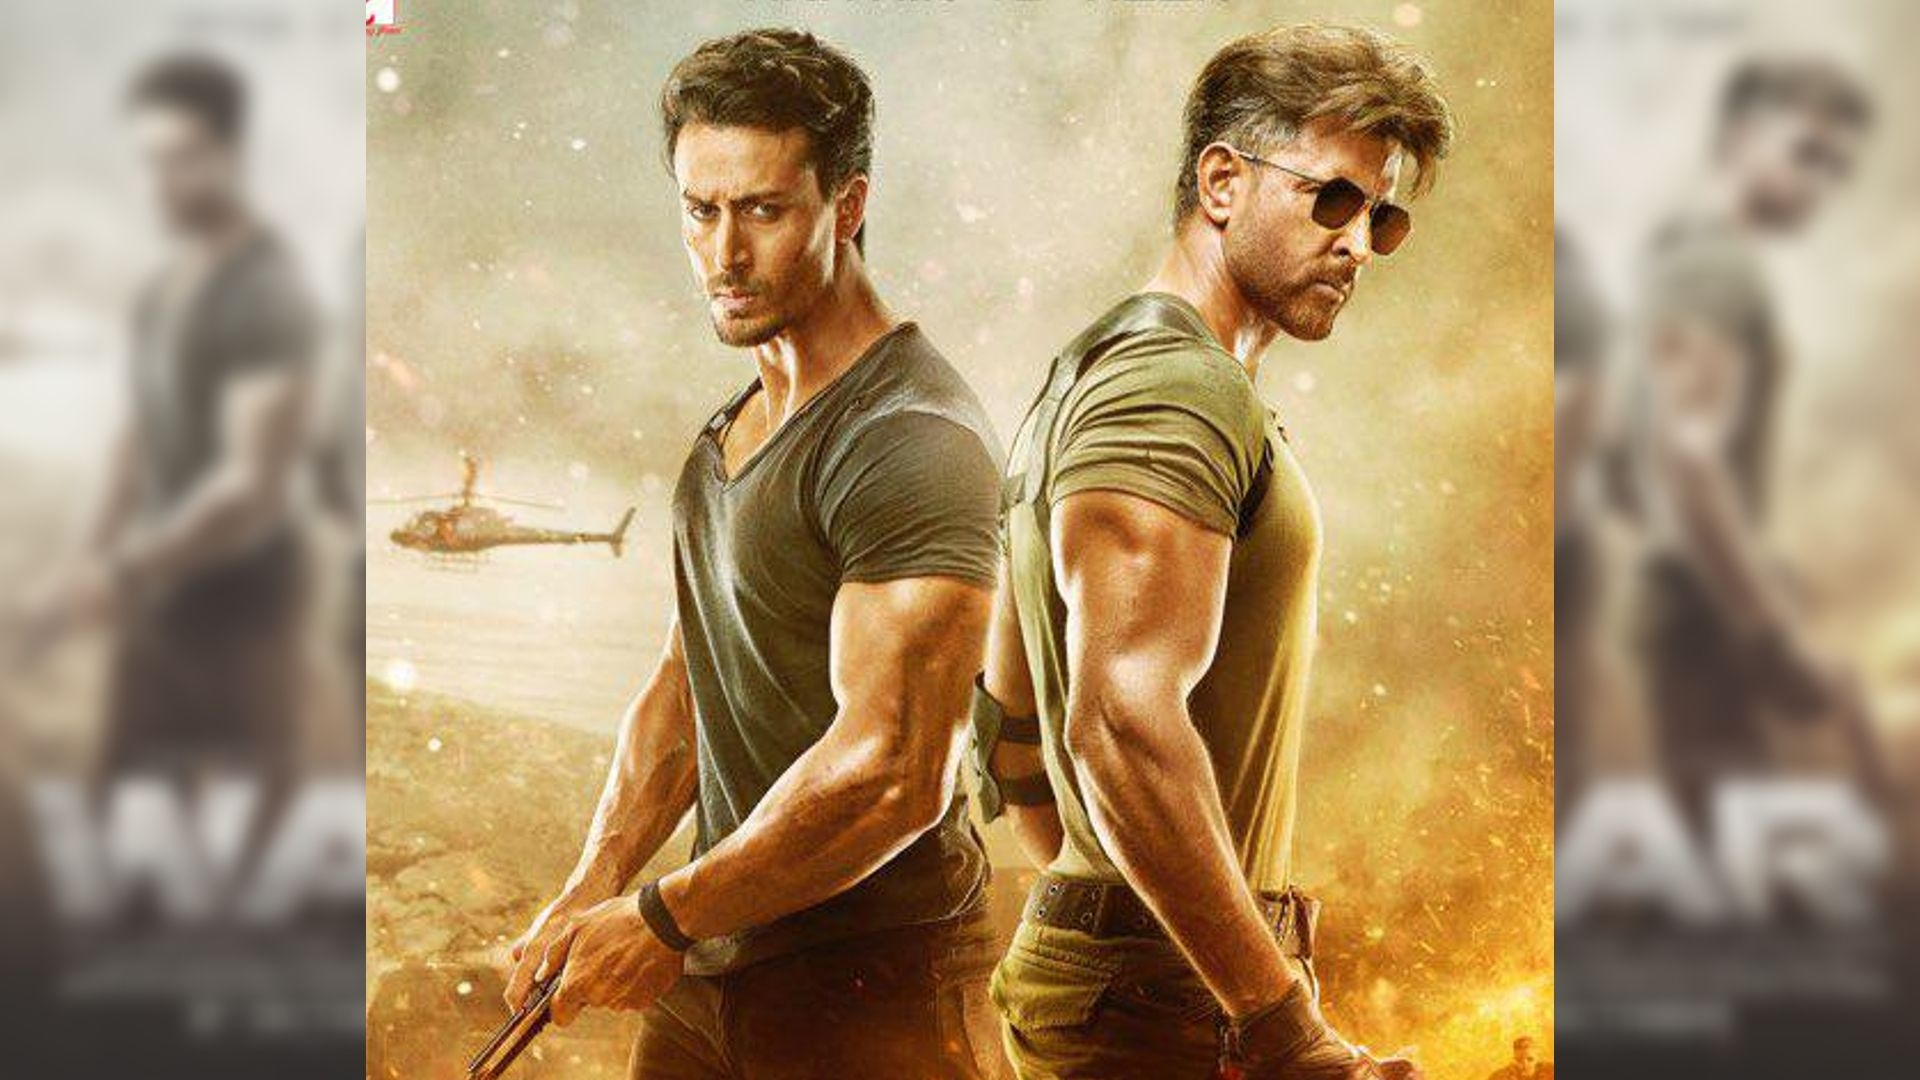 'War' Overtakes 'Kabir Singh', Becomes Highest BO Grosser of 2019